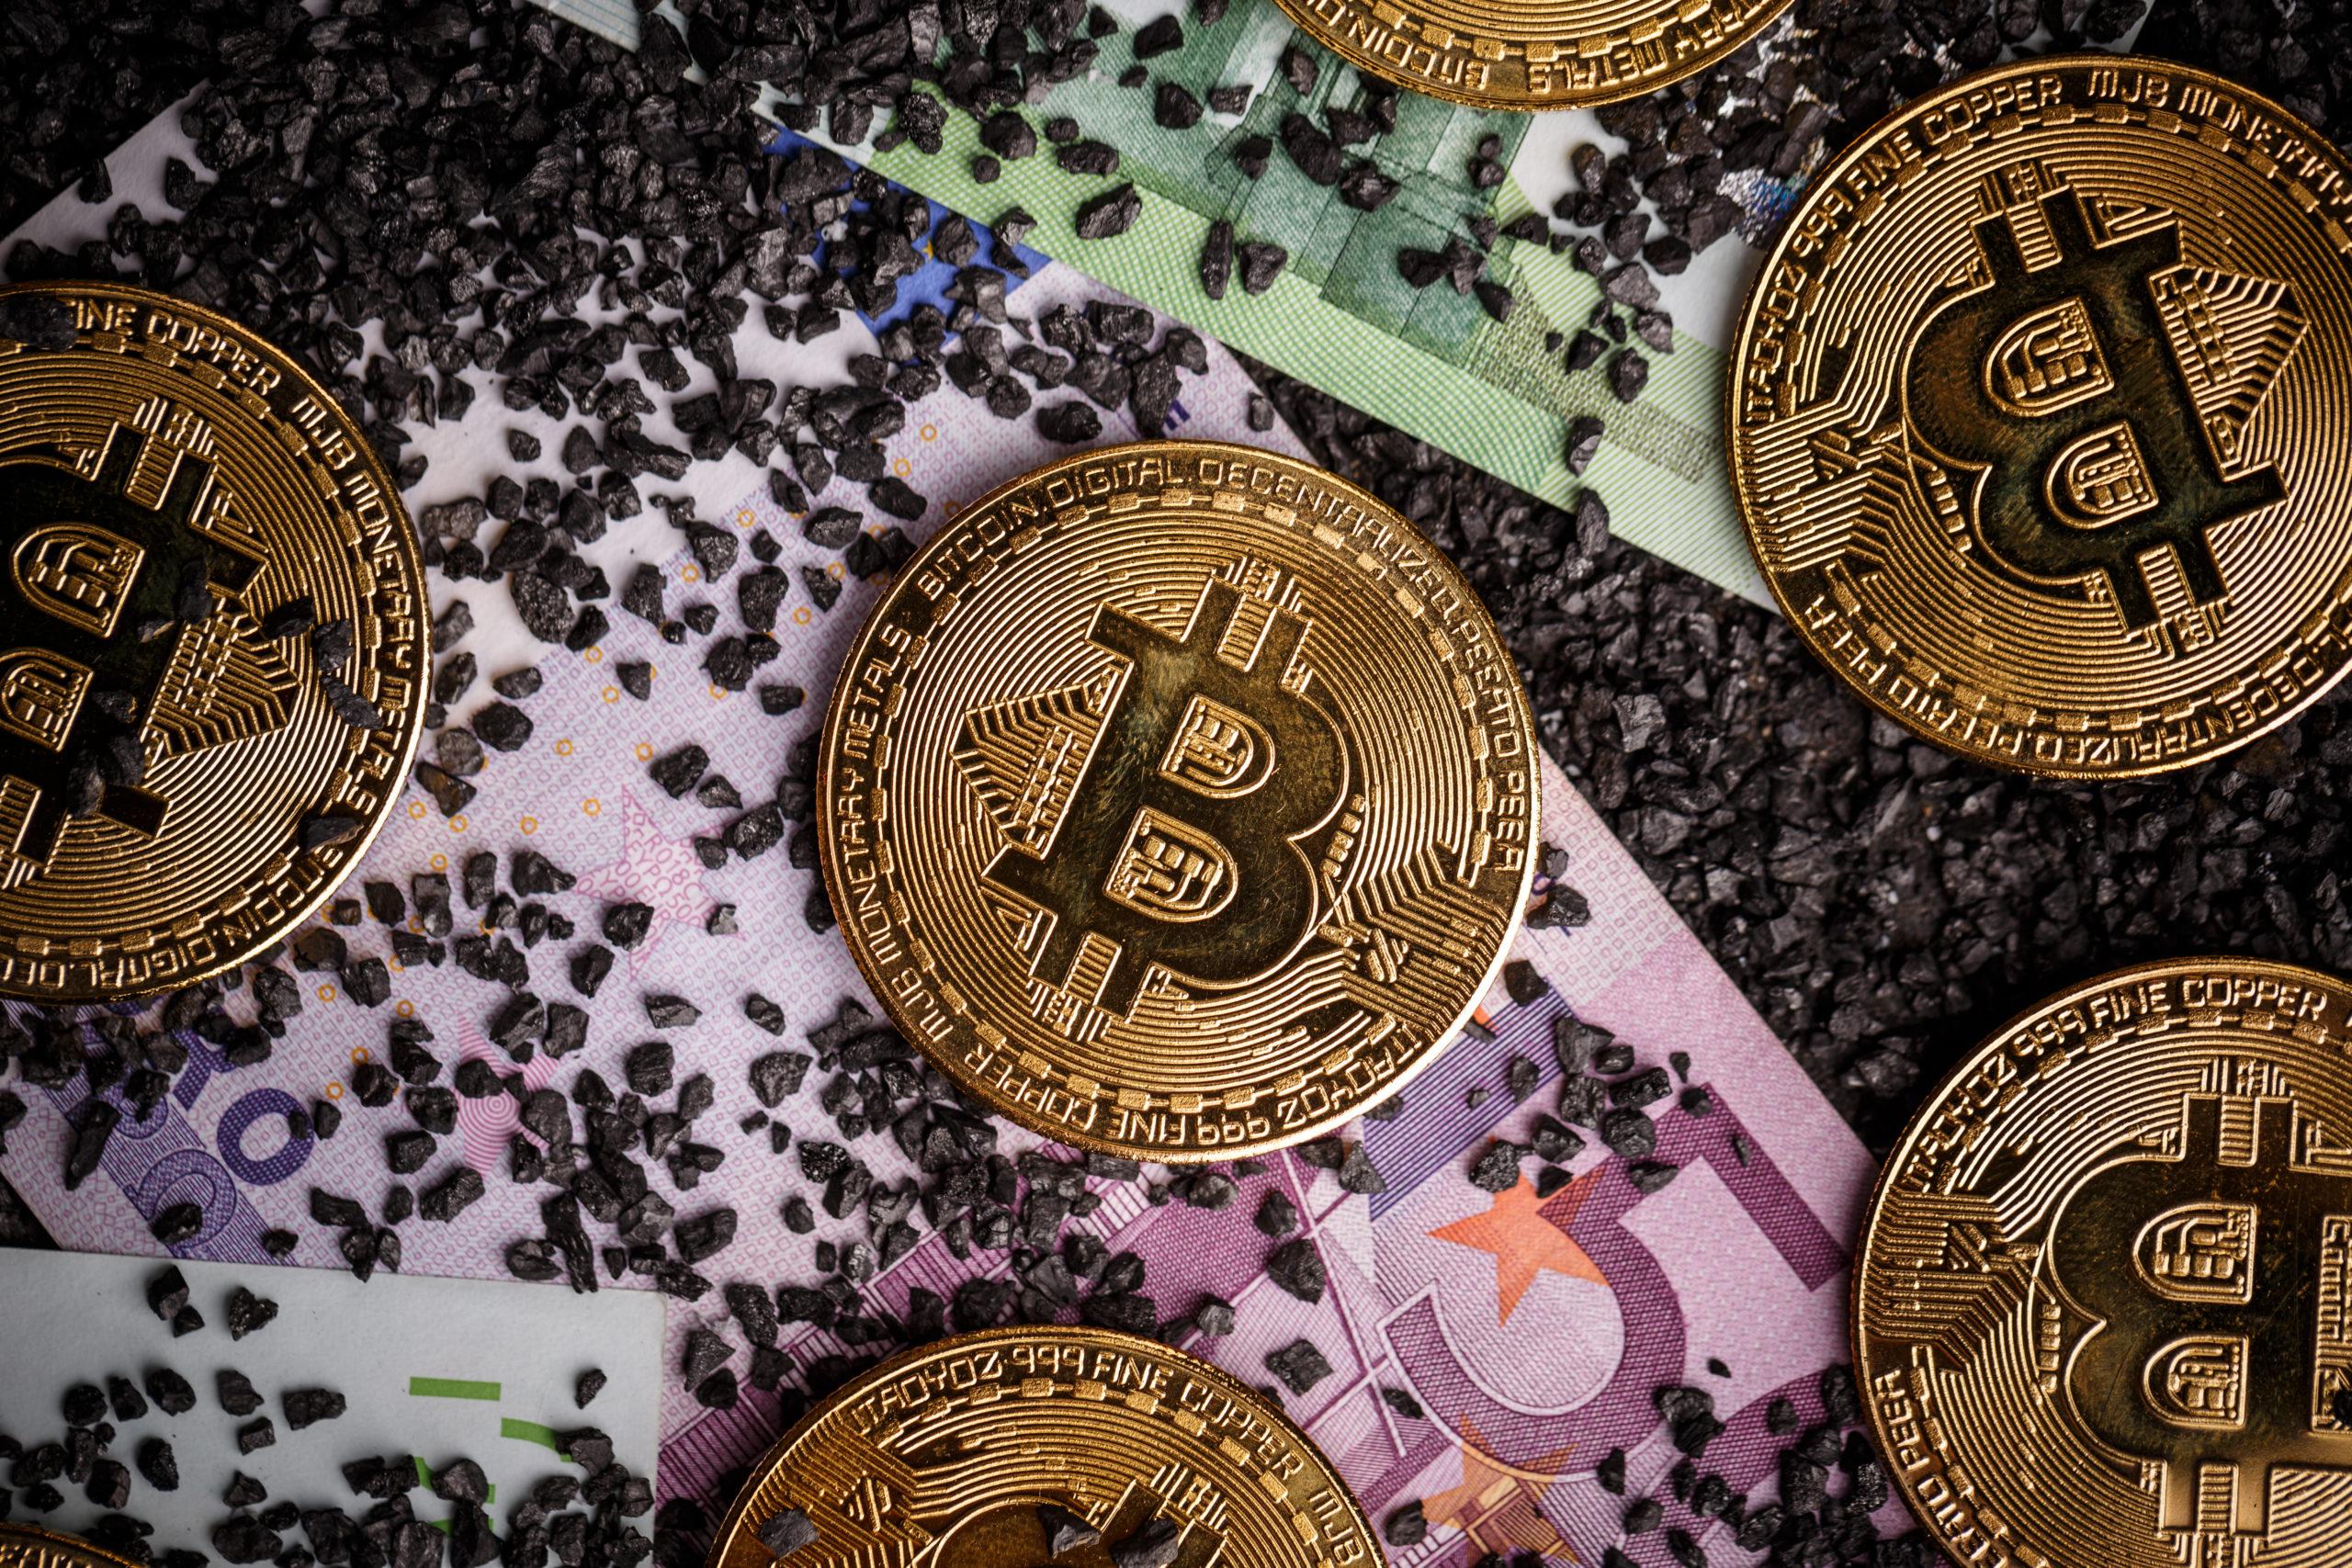 crypto quant trading otc trading btc